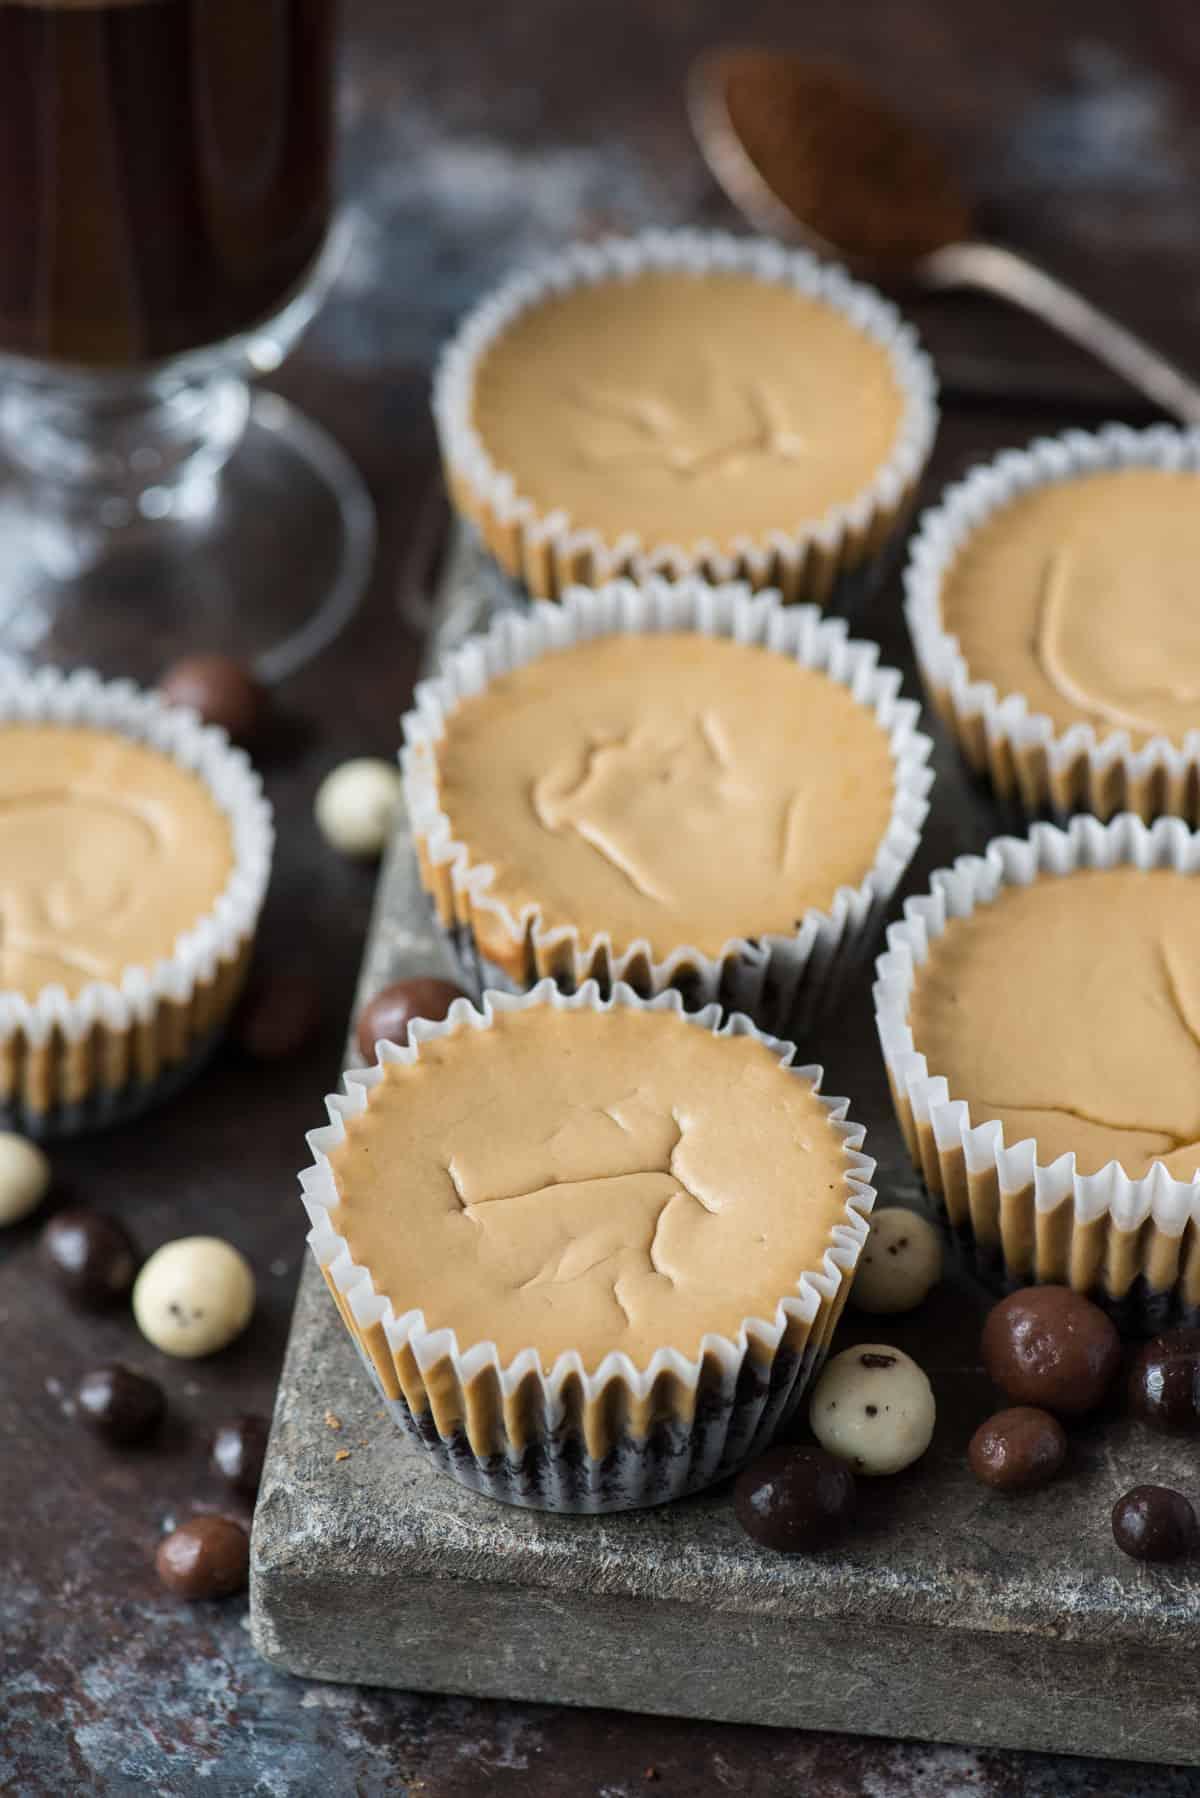 mini coffee cheesecakes on stone slab with espresso beans